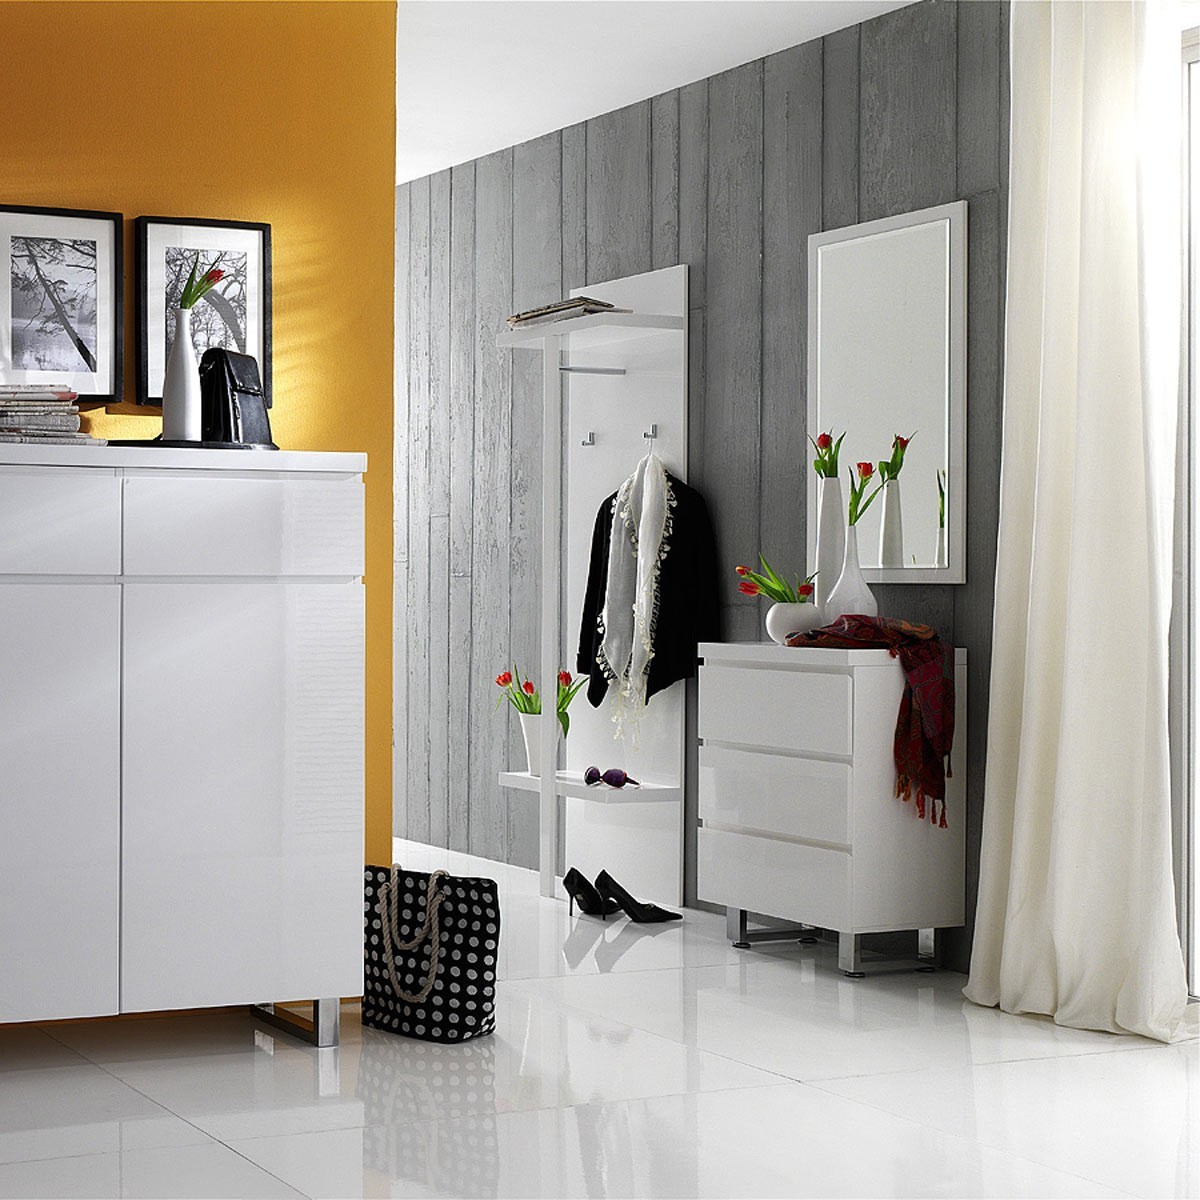 sonoma eiche paneele interessante ideen f r. Black Bedroom Furniture Sets. Home Design Ideas